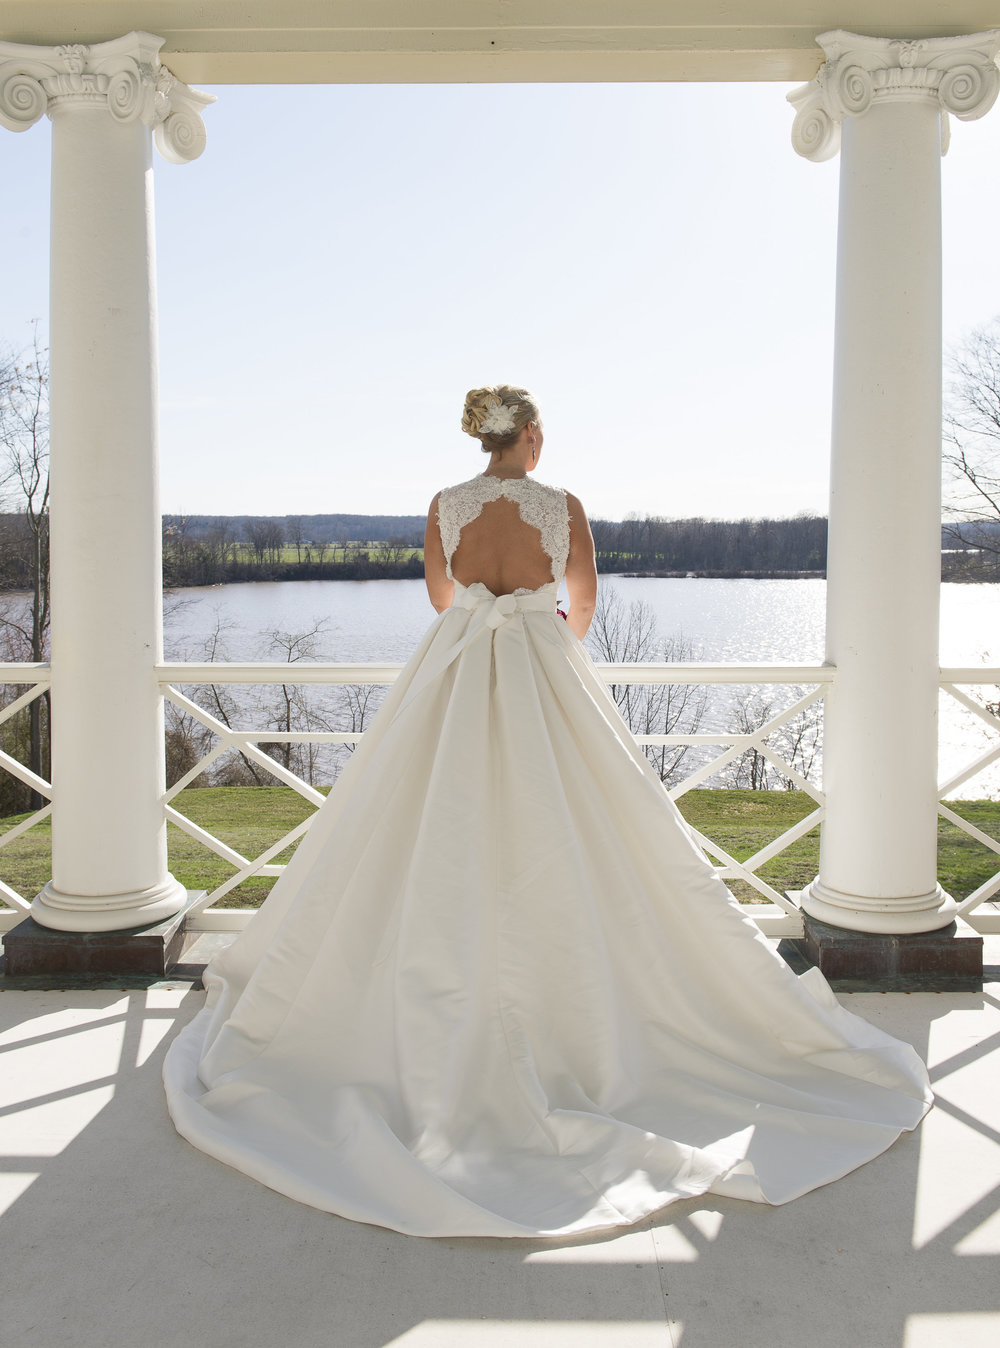 Brides and Weddings Shoot-belle grove style-0209.jpg